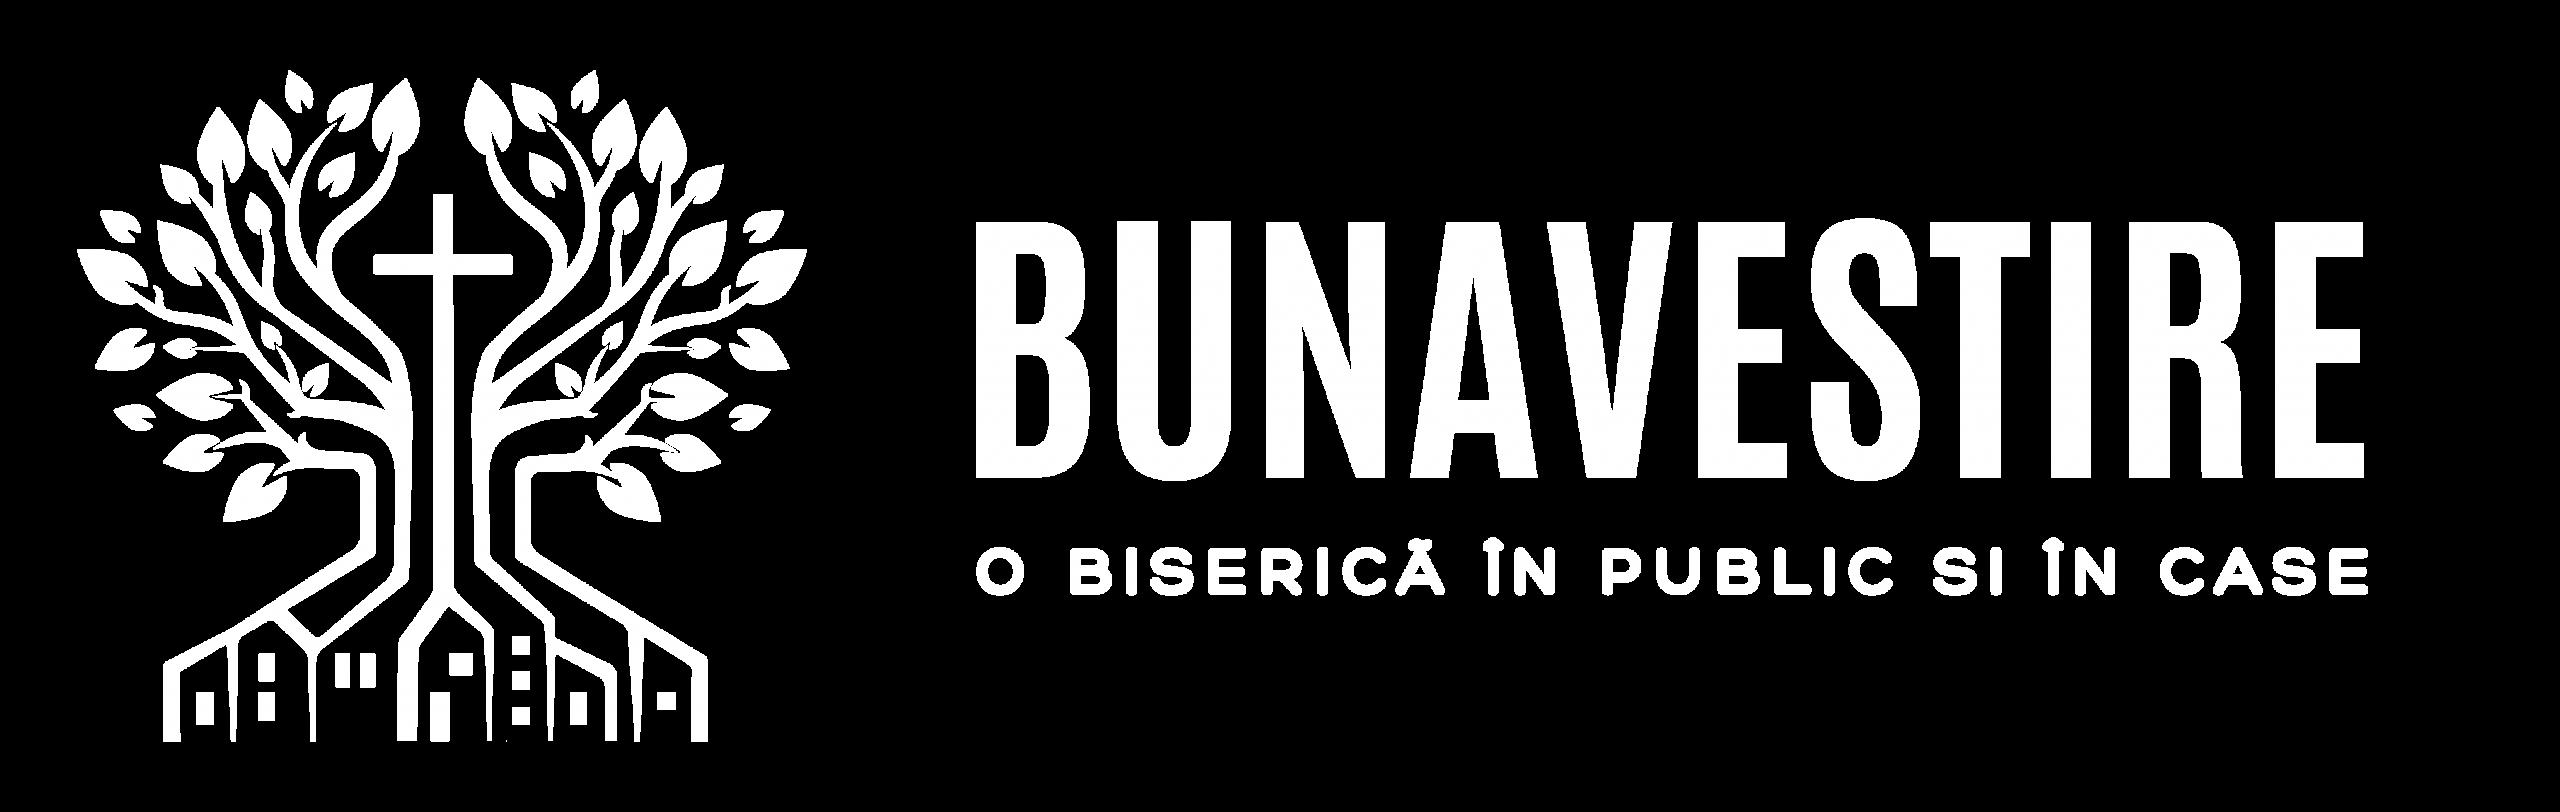 Bunavestire